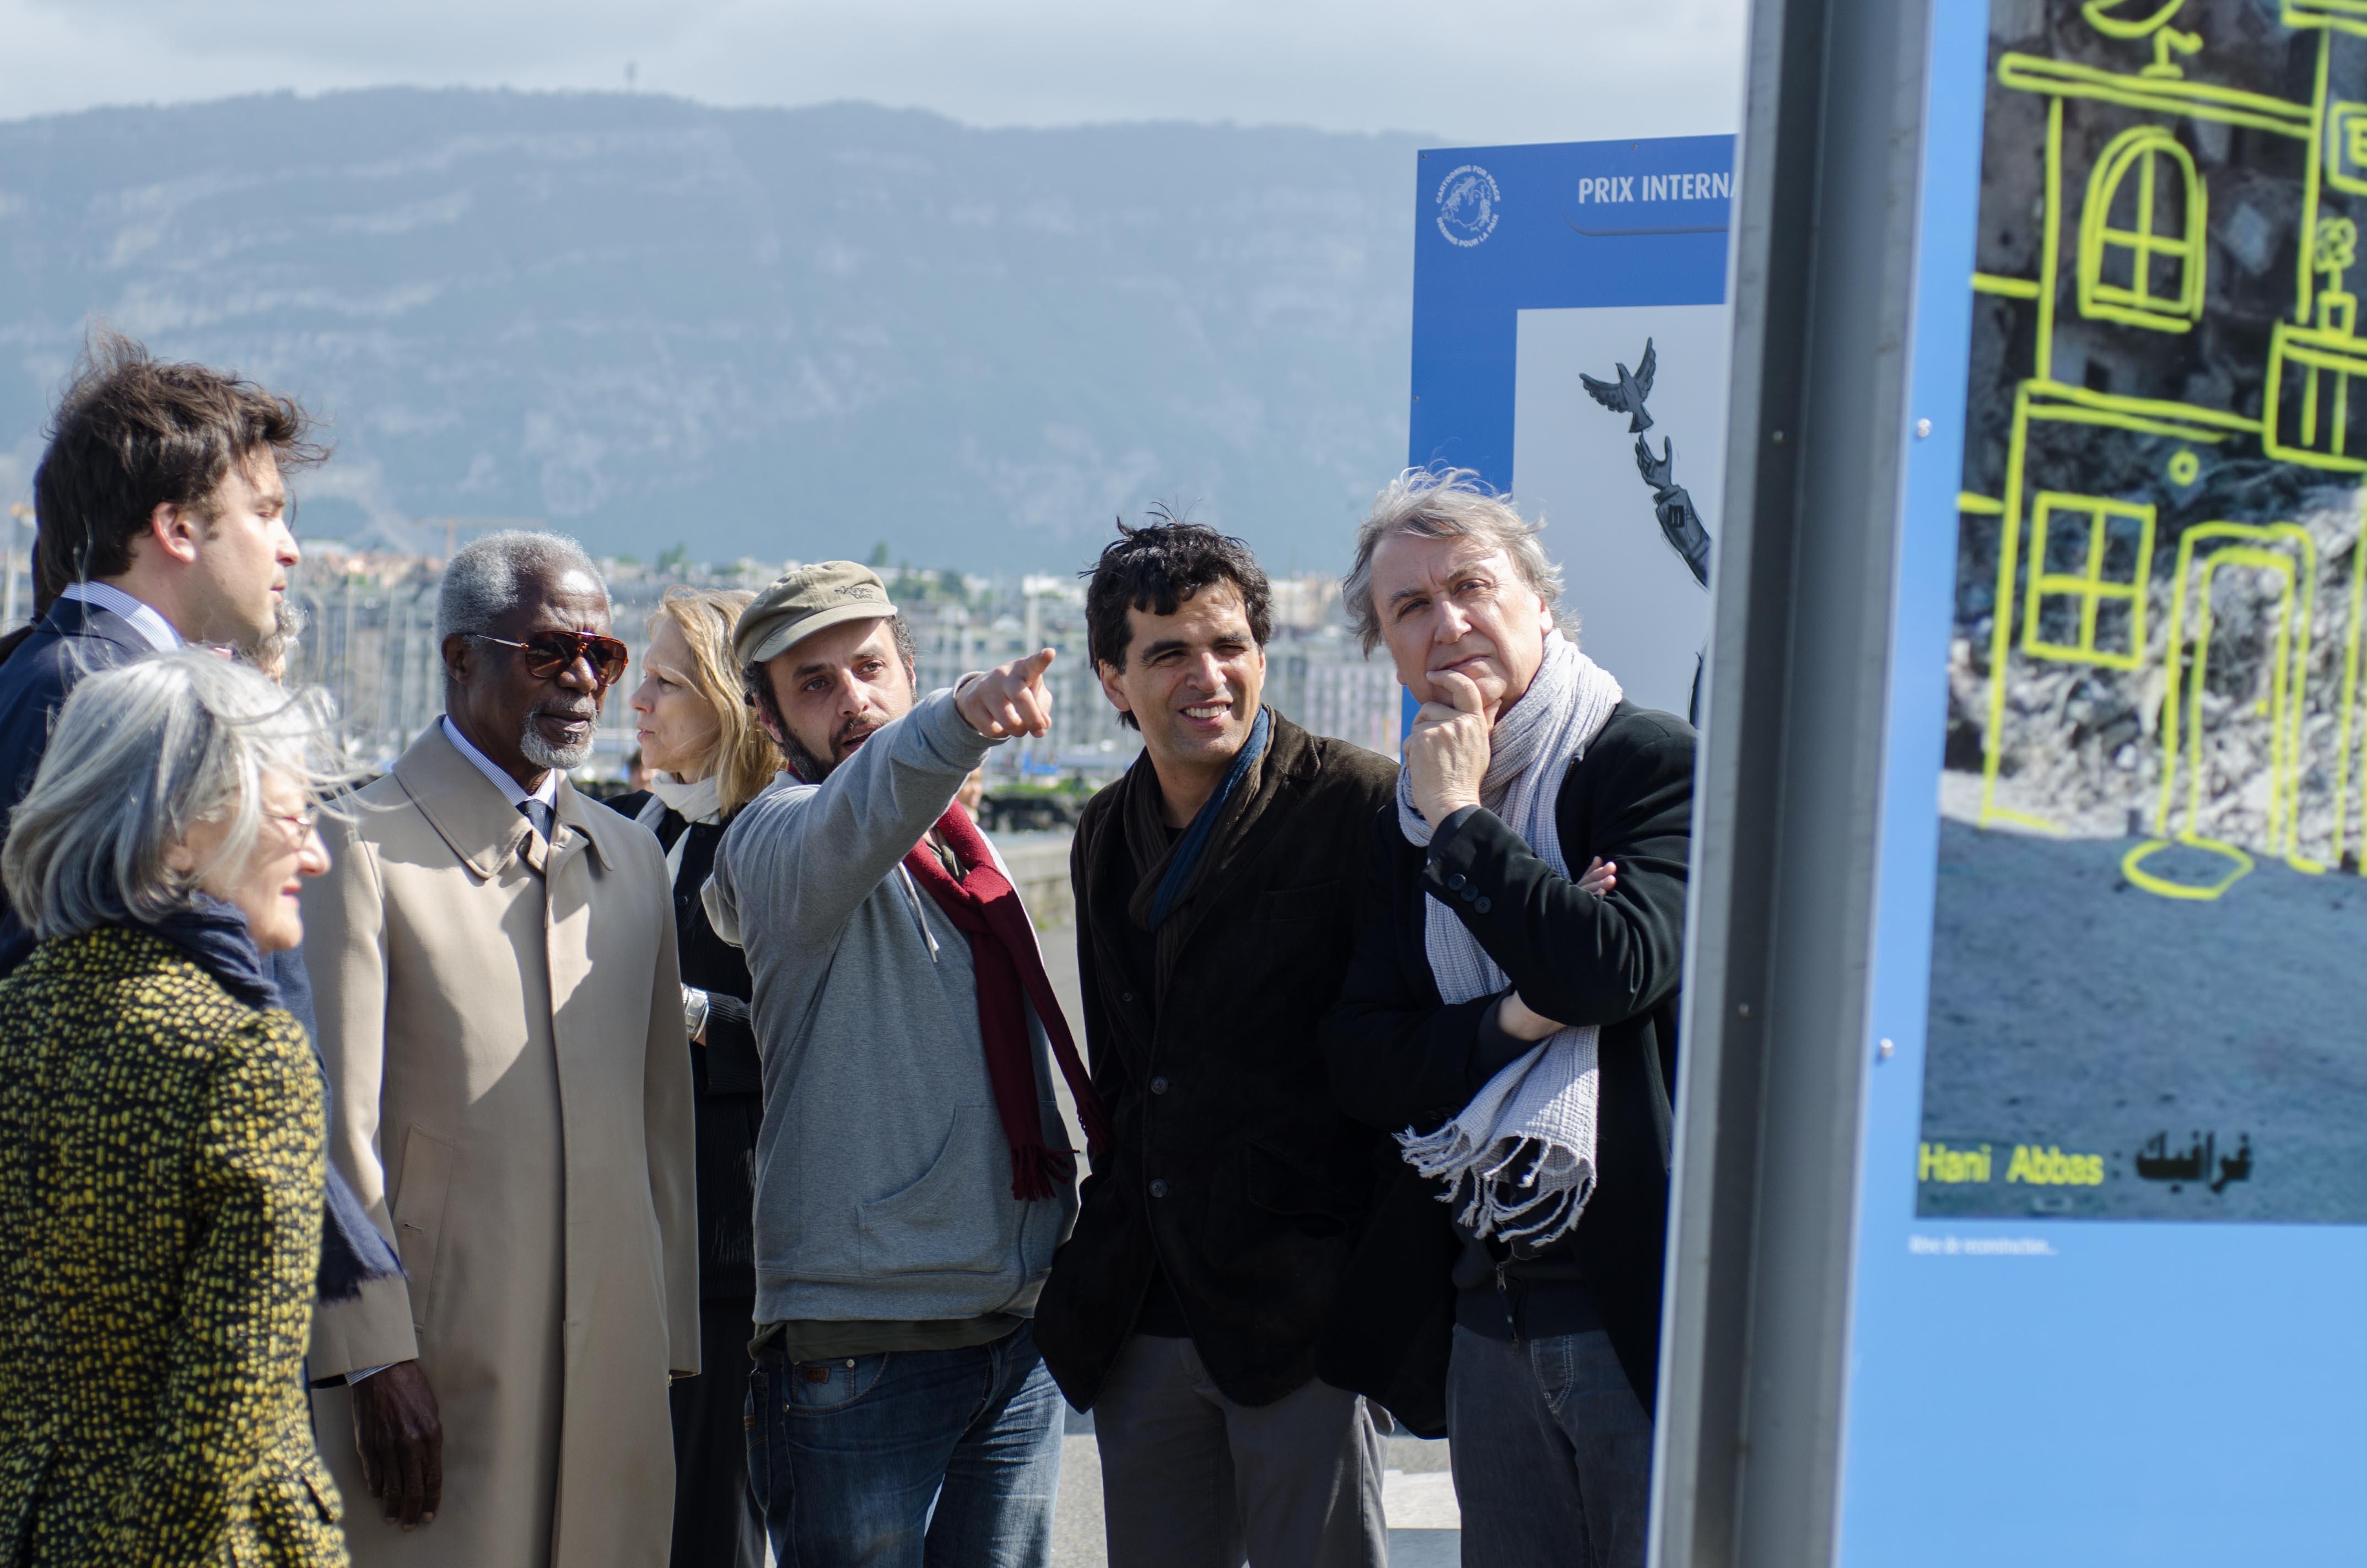 Inauguration de l'exposition, le 3 mai 2014